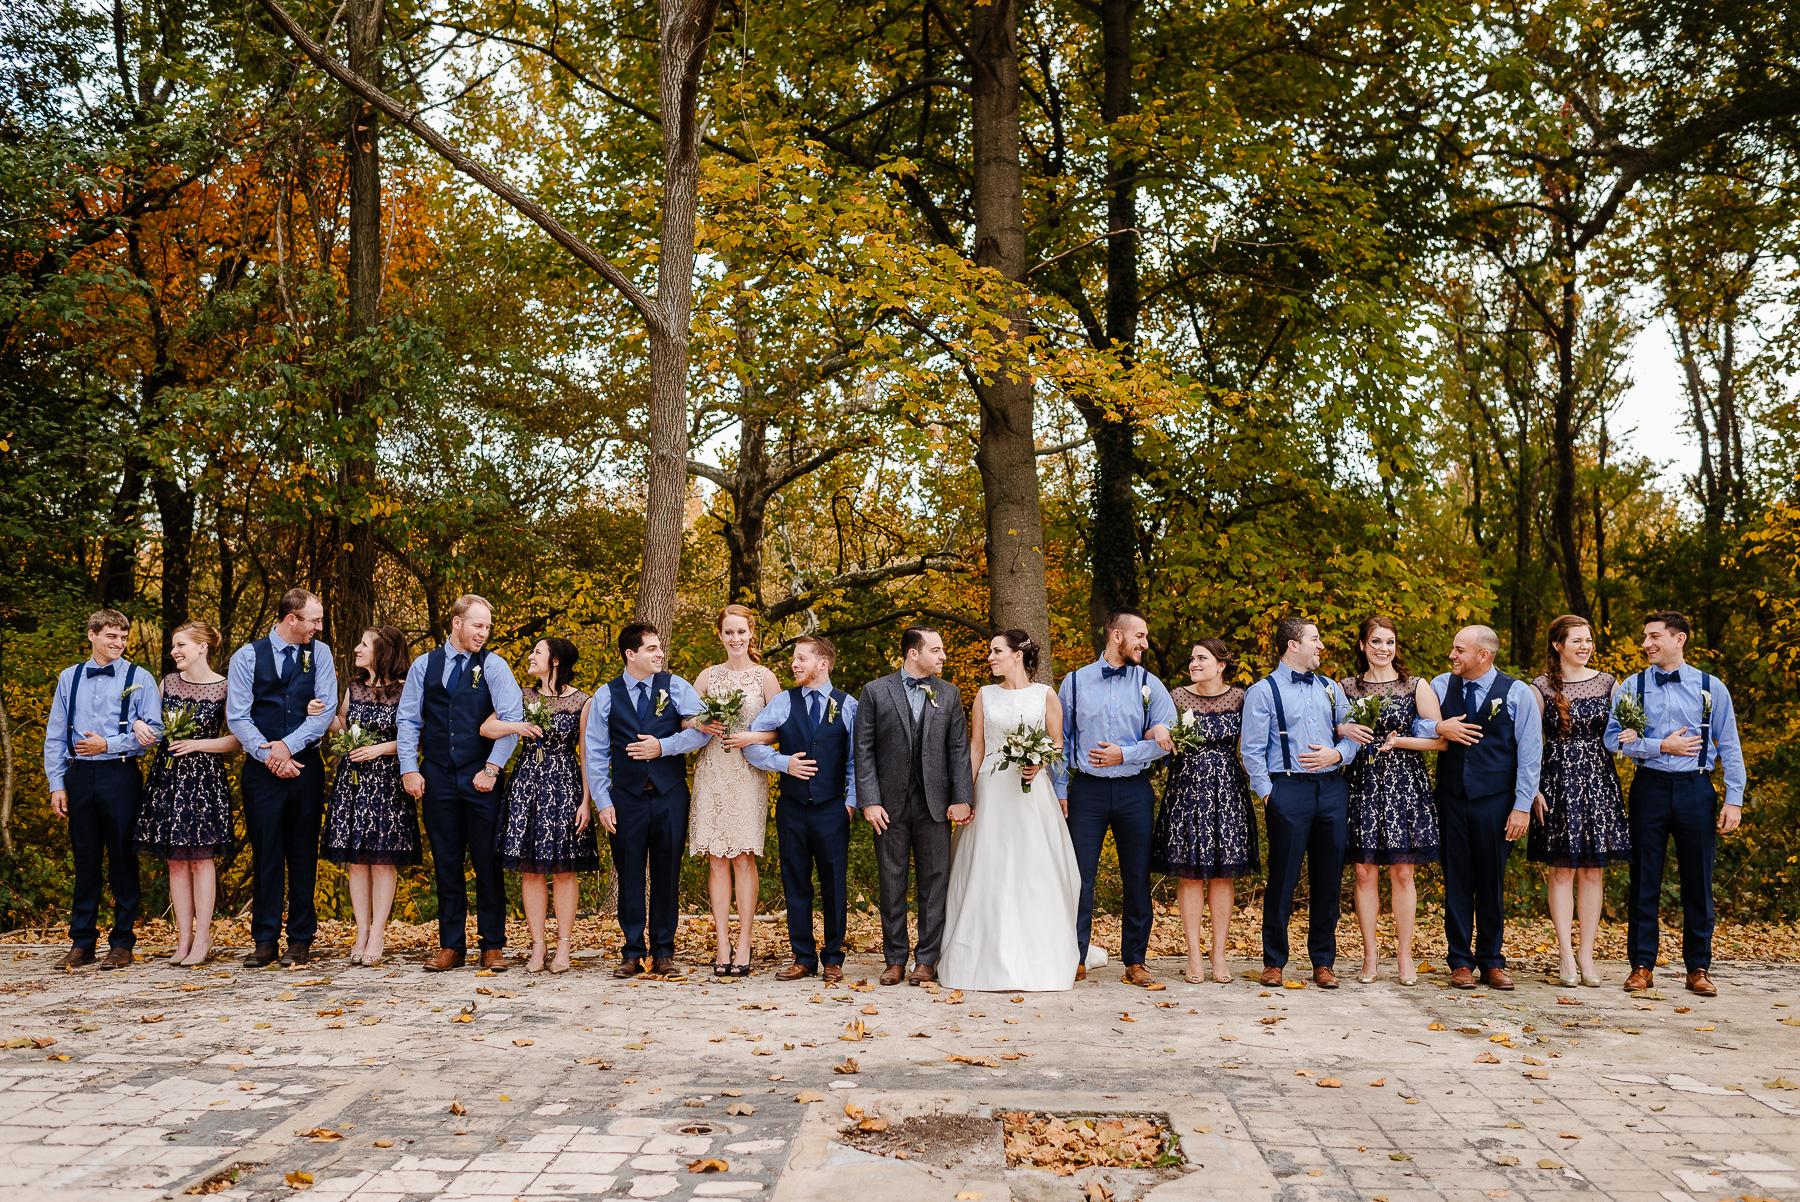 56-Laurita Winery Wedding New Jersey Wedding Photographer Laurita Winery Weddings Longbrook Photography.jpg